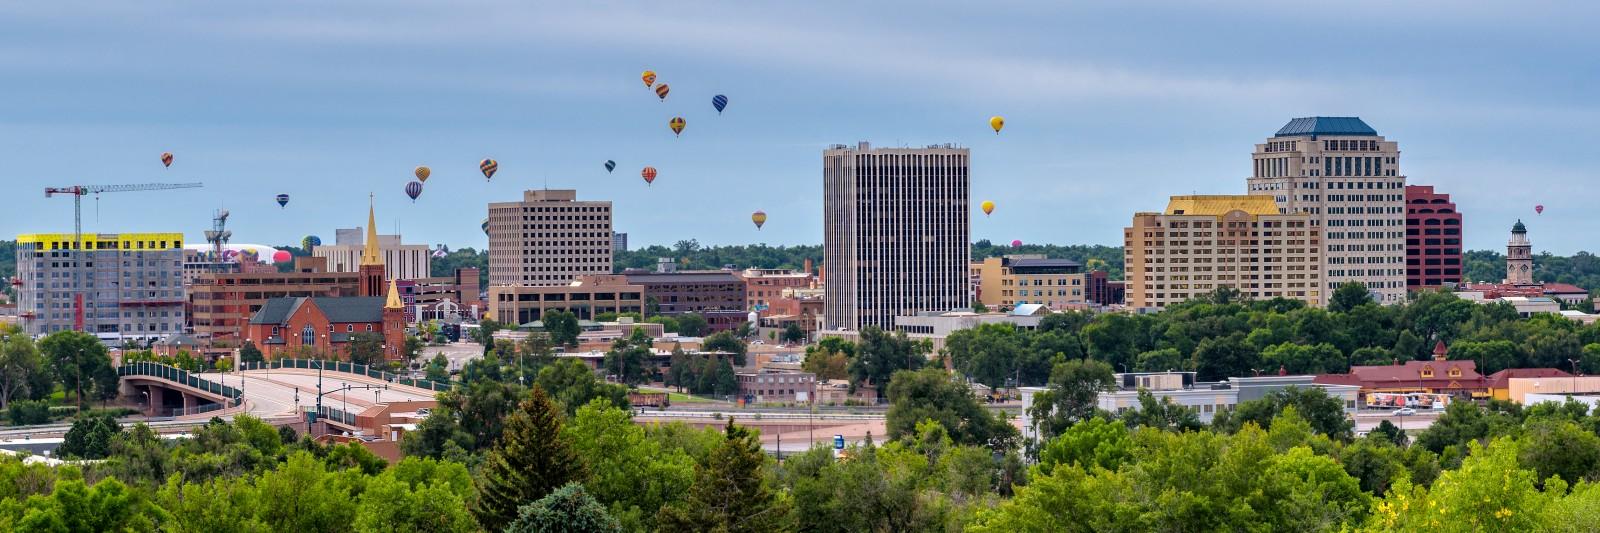 Downtown Colorado Springs, Colo.